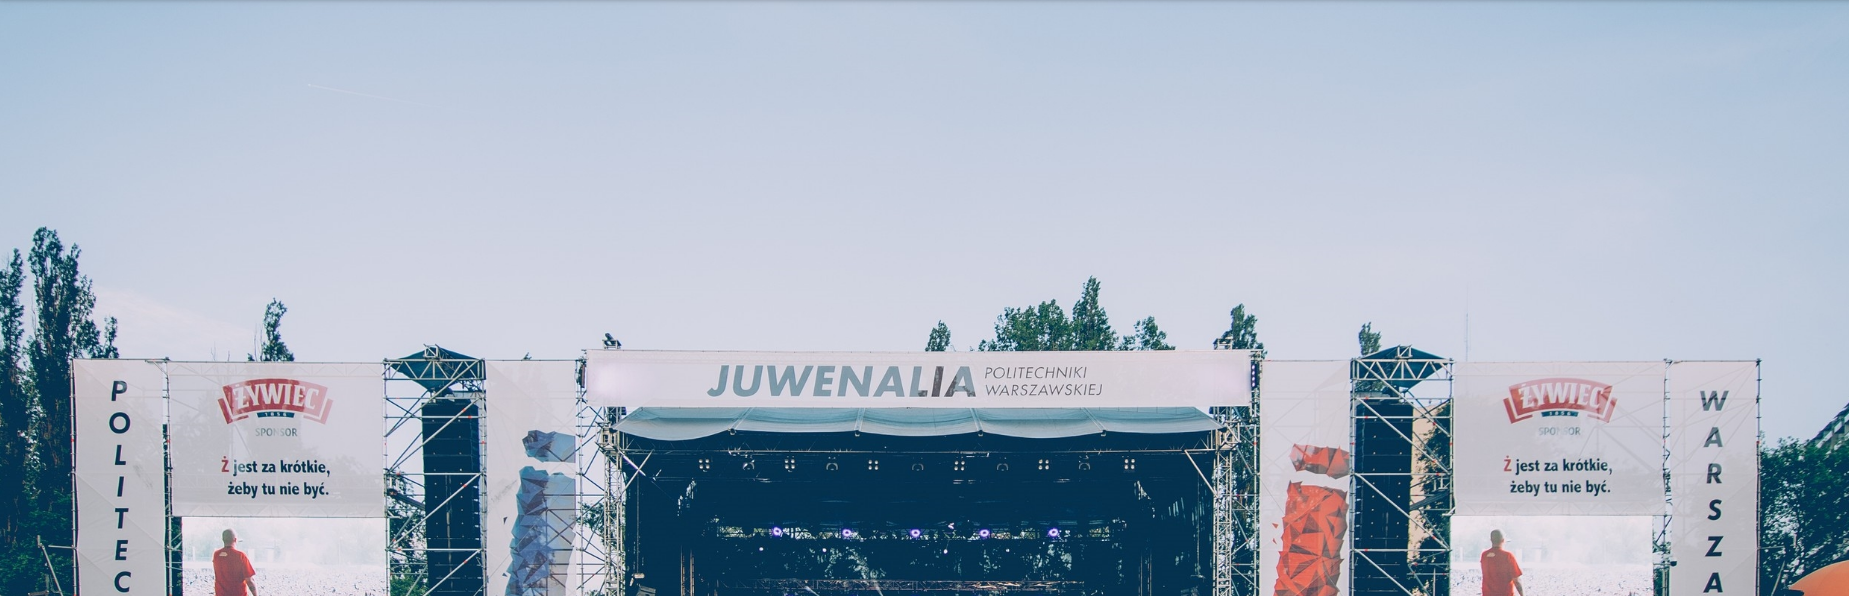 Juwenalia 2018